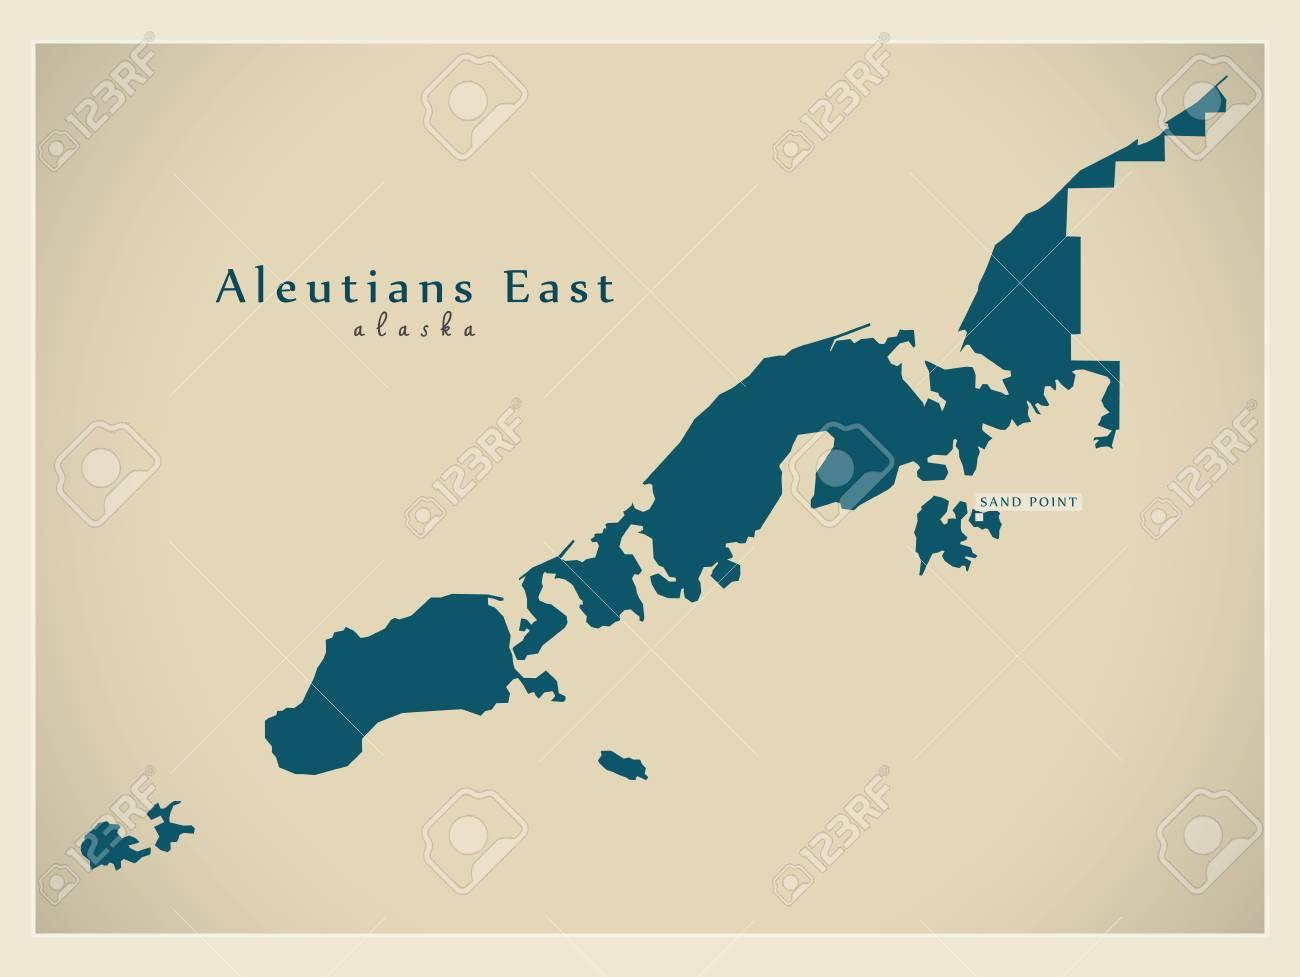 Modern Map - Aleutians East Alaska County USA Illustration Royalty ...